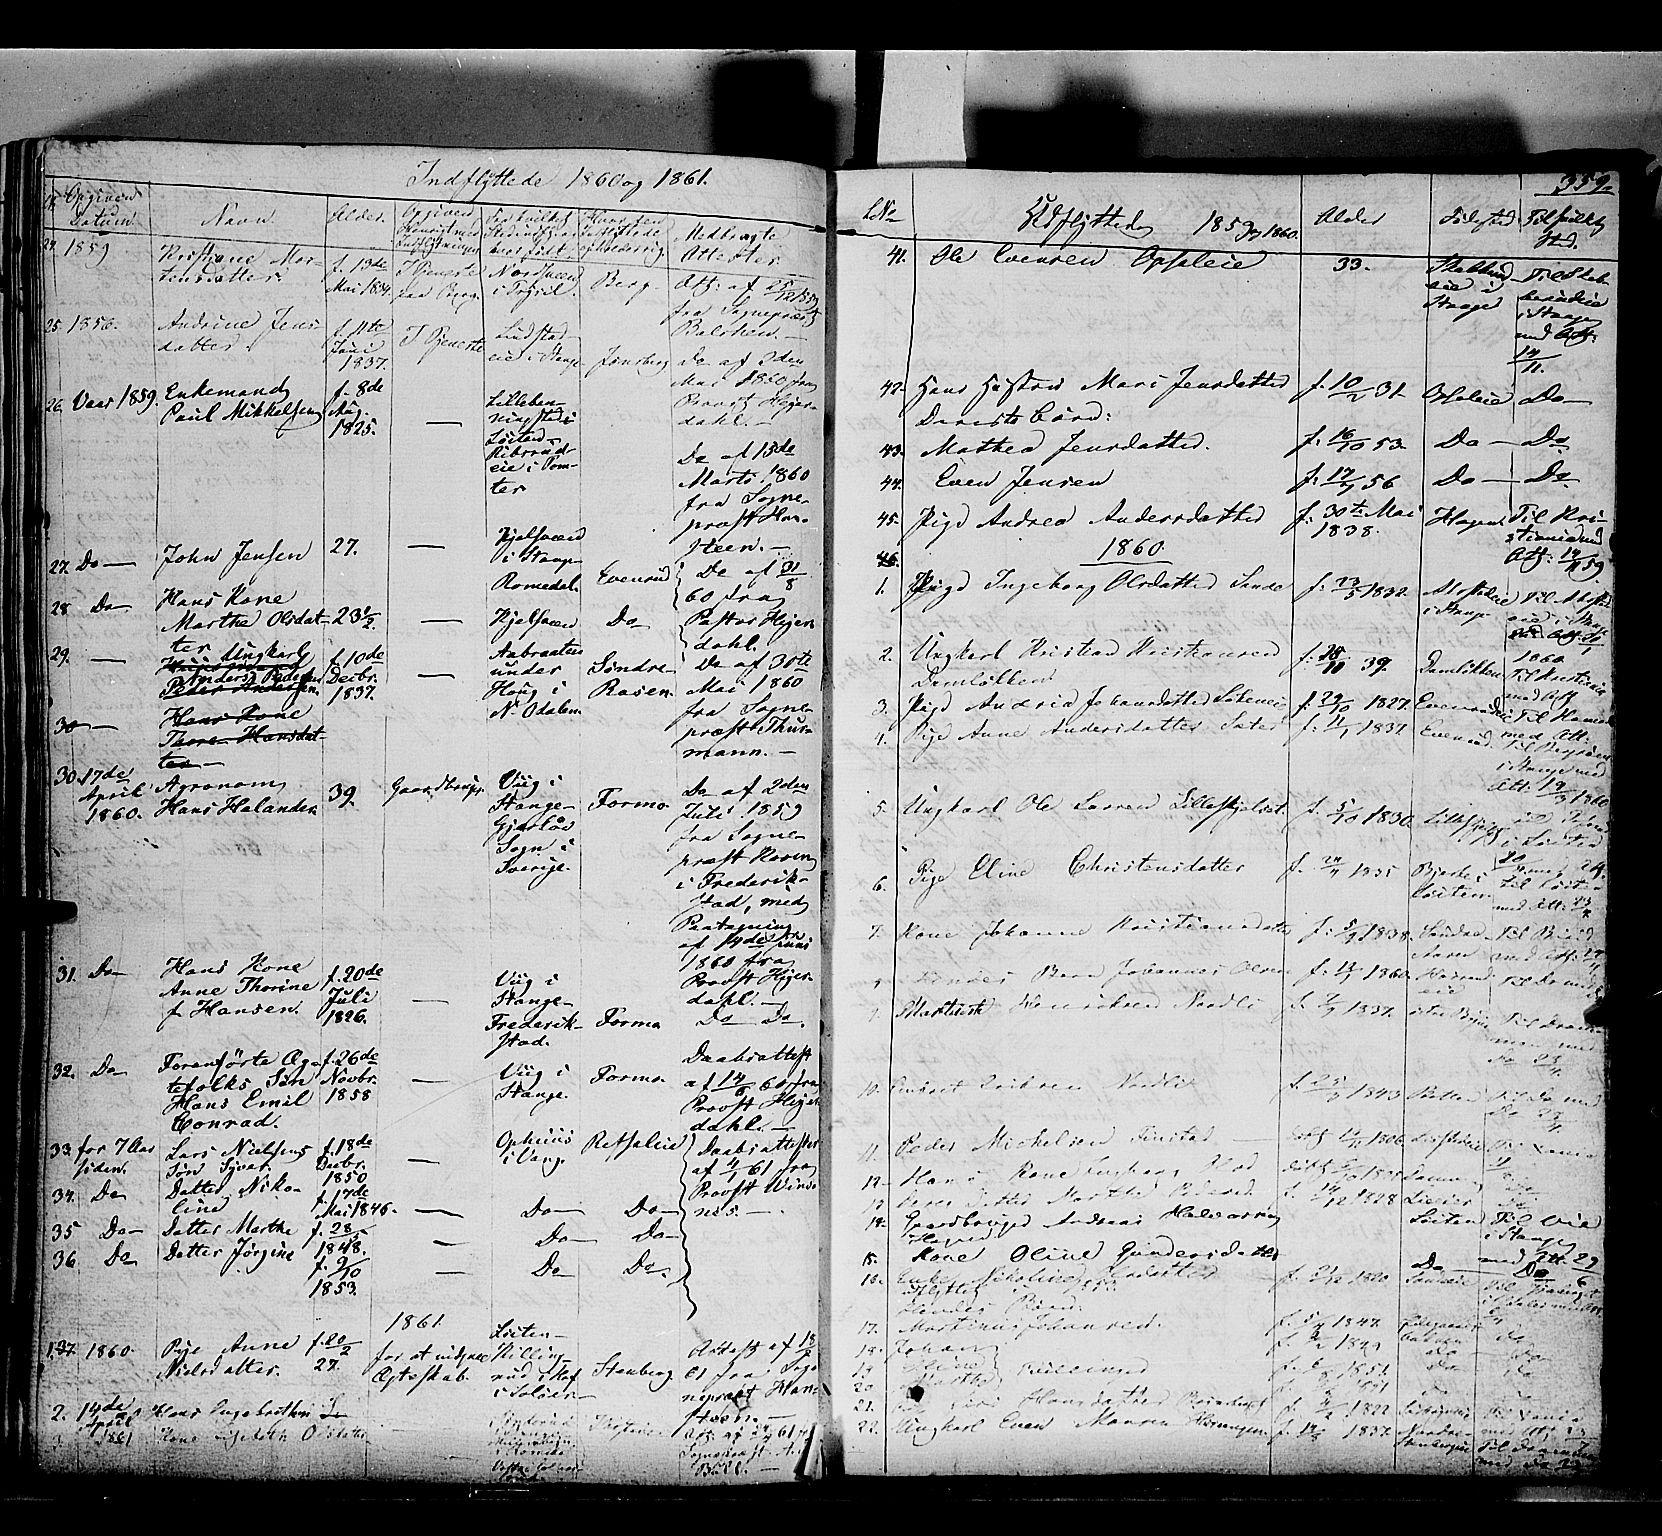 SAH, Romedal prestekontor, K/L0004: Ministerialbok nr. 4, 1847-1861, s. 359